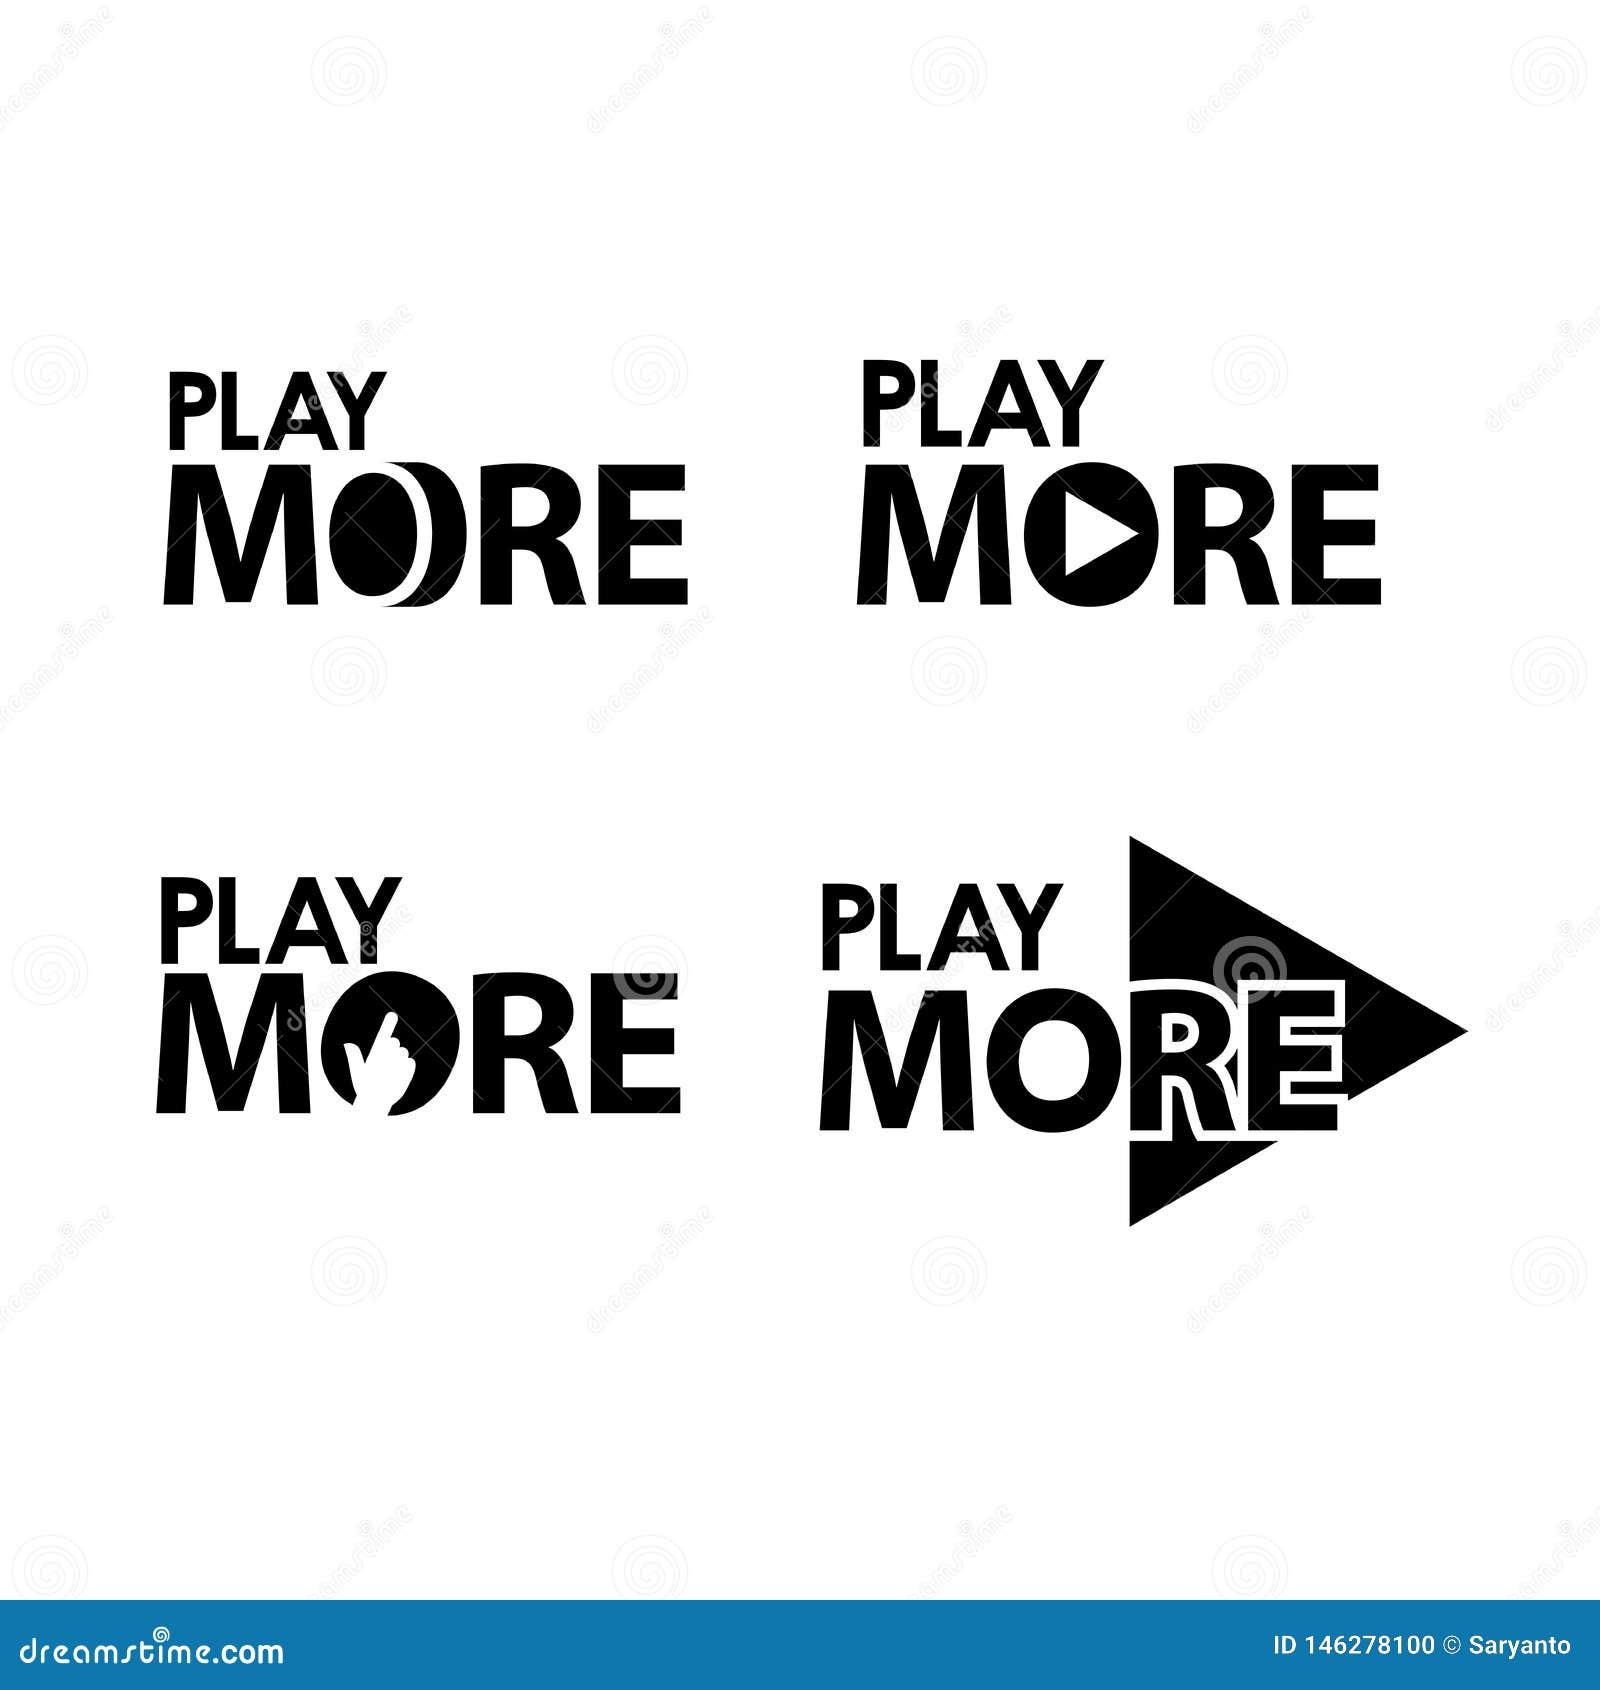 Play more. Creative lettering vector illustration. illustration in vector format.